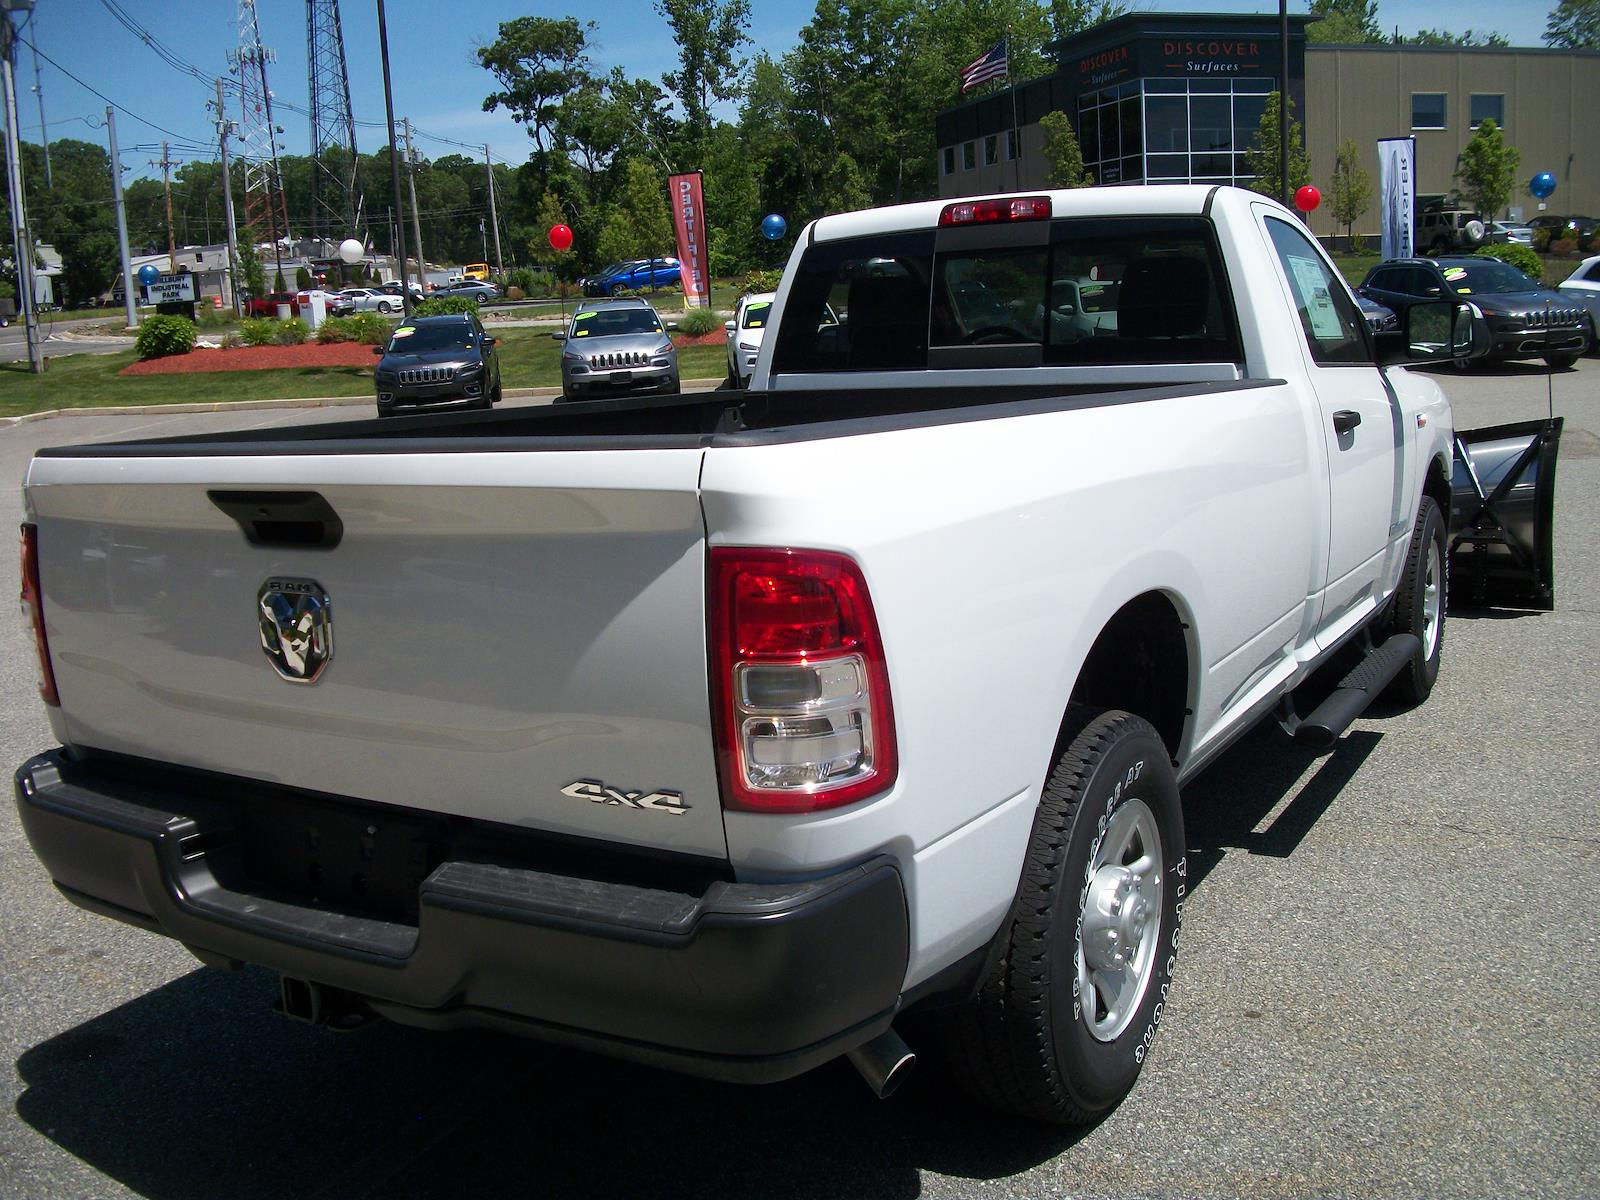 2020 Ram 2500 Regular Cab 4x4, Pickup #21358 - photo 1